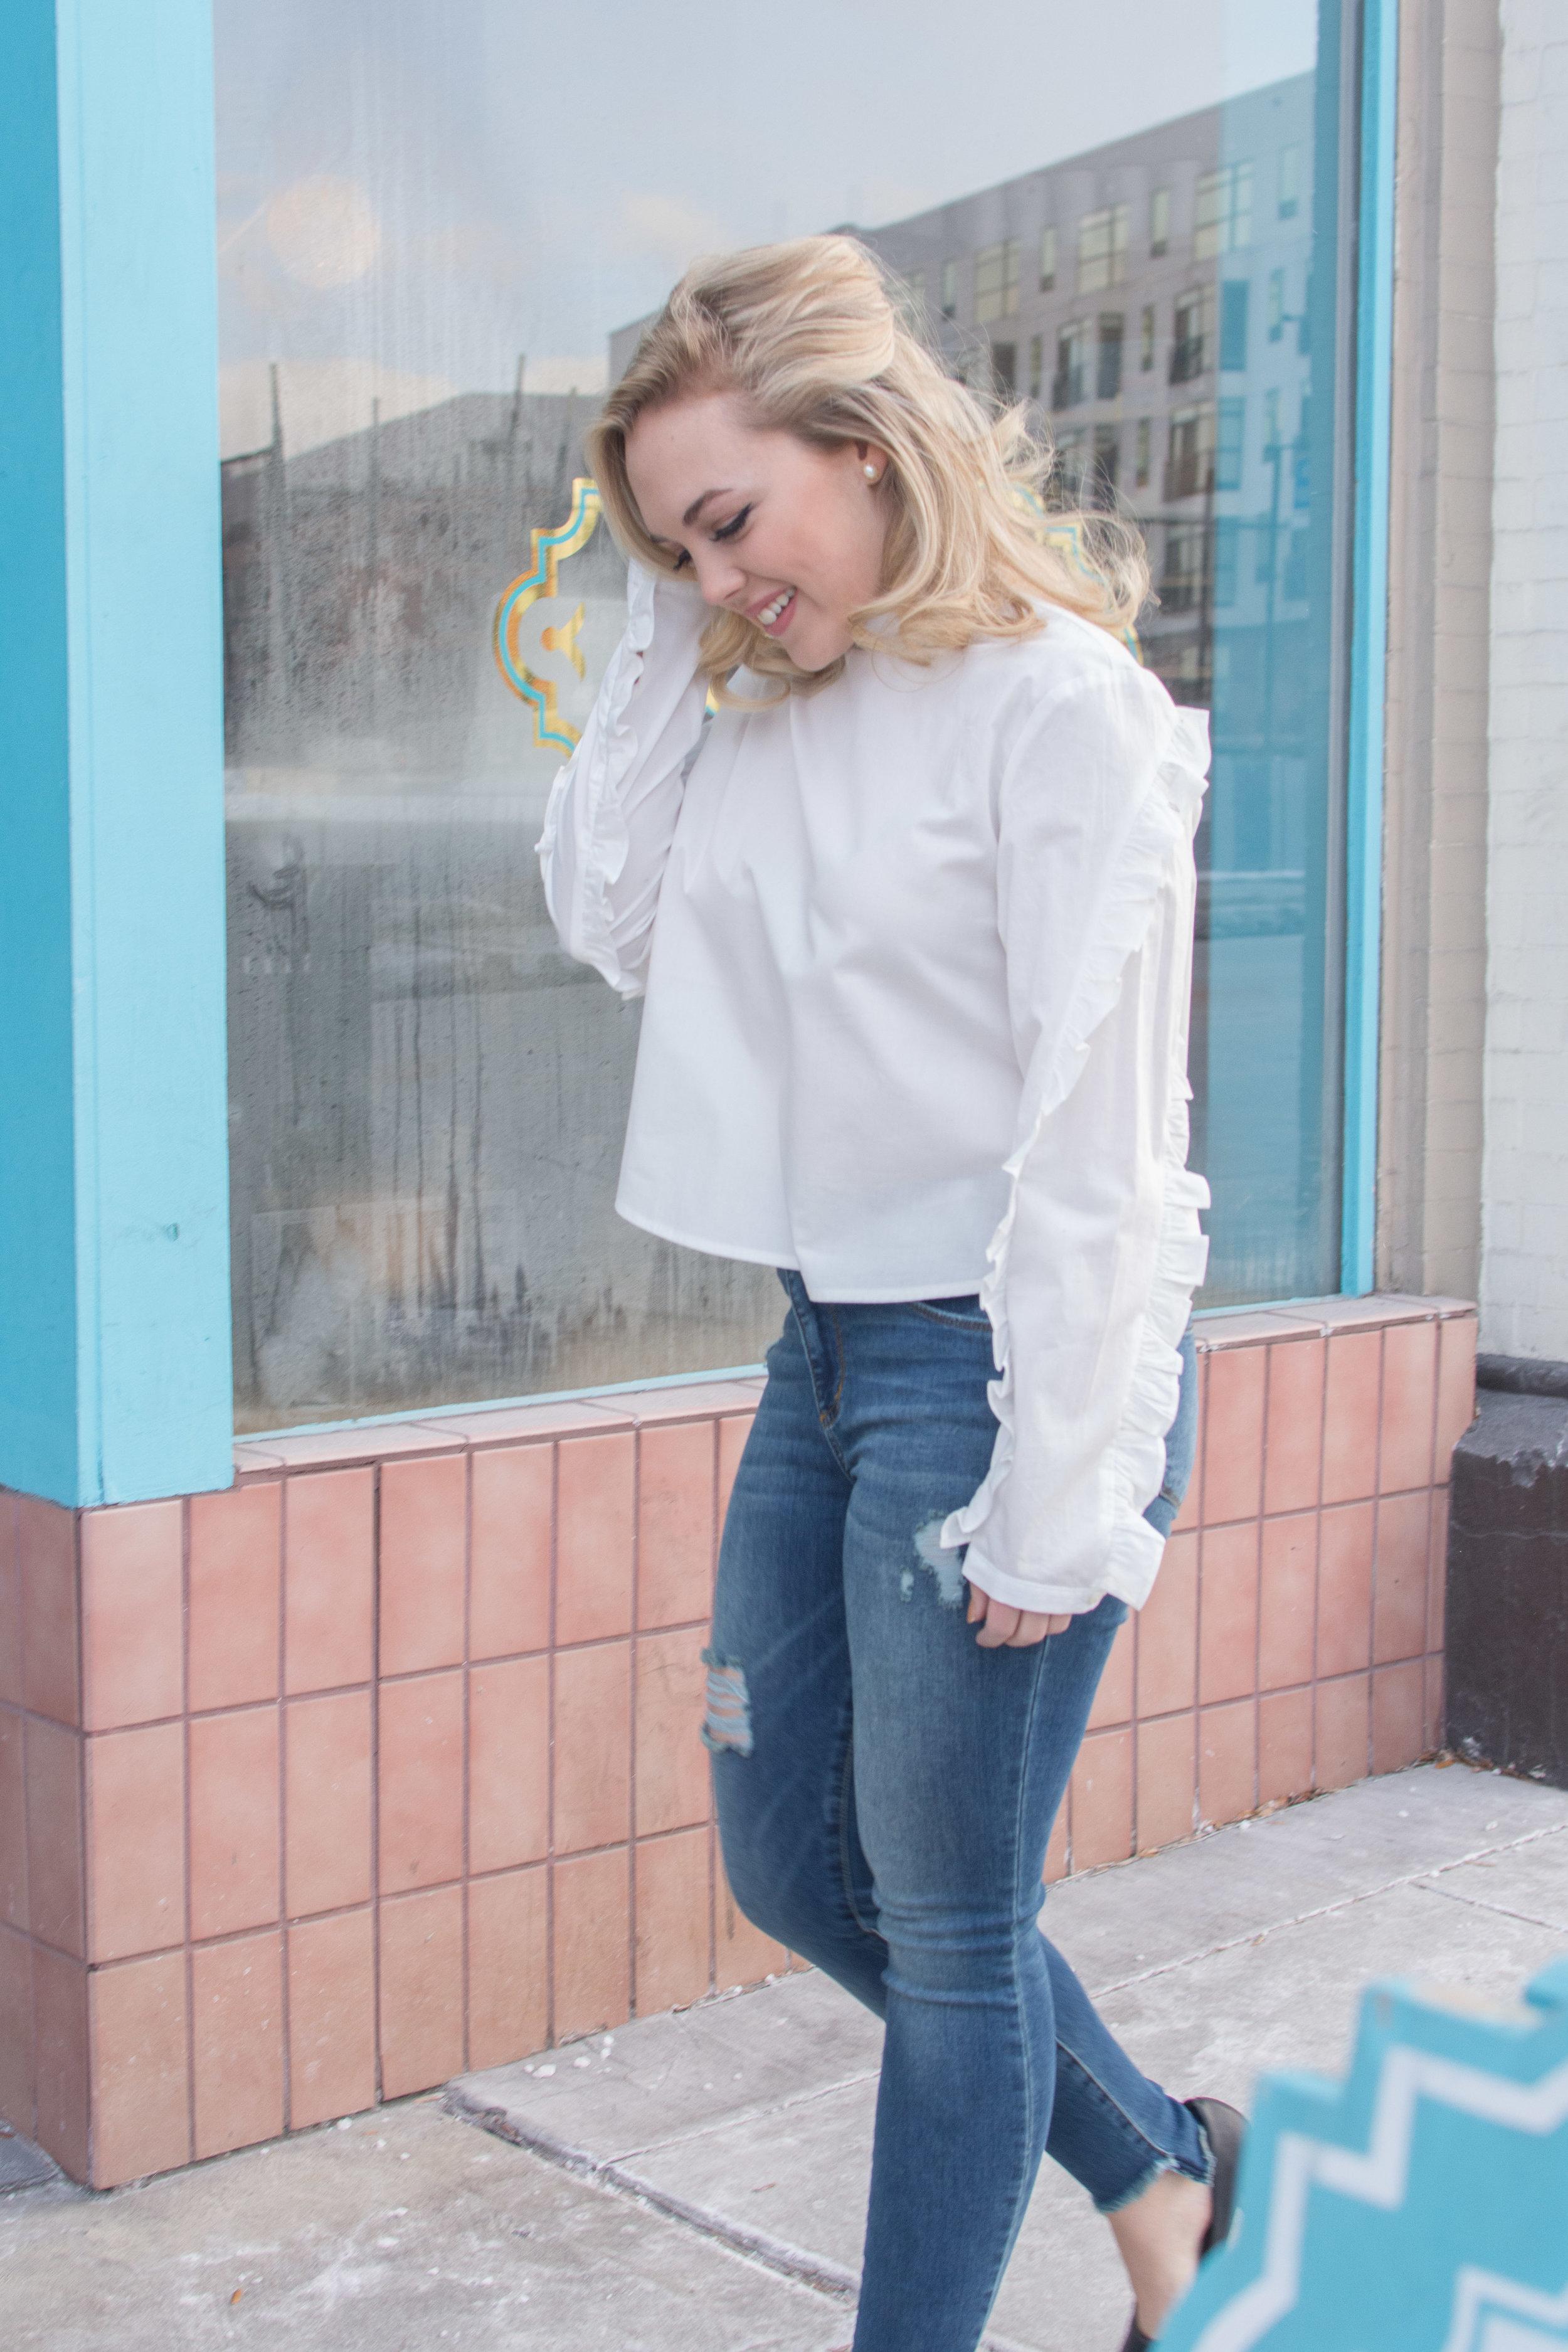 Avec les filles blouse (Sold out, but similar   here  ),   STS blue jeans  , vintage earrings, Kmart shoes (old)